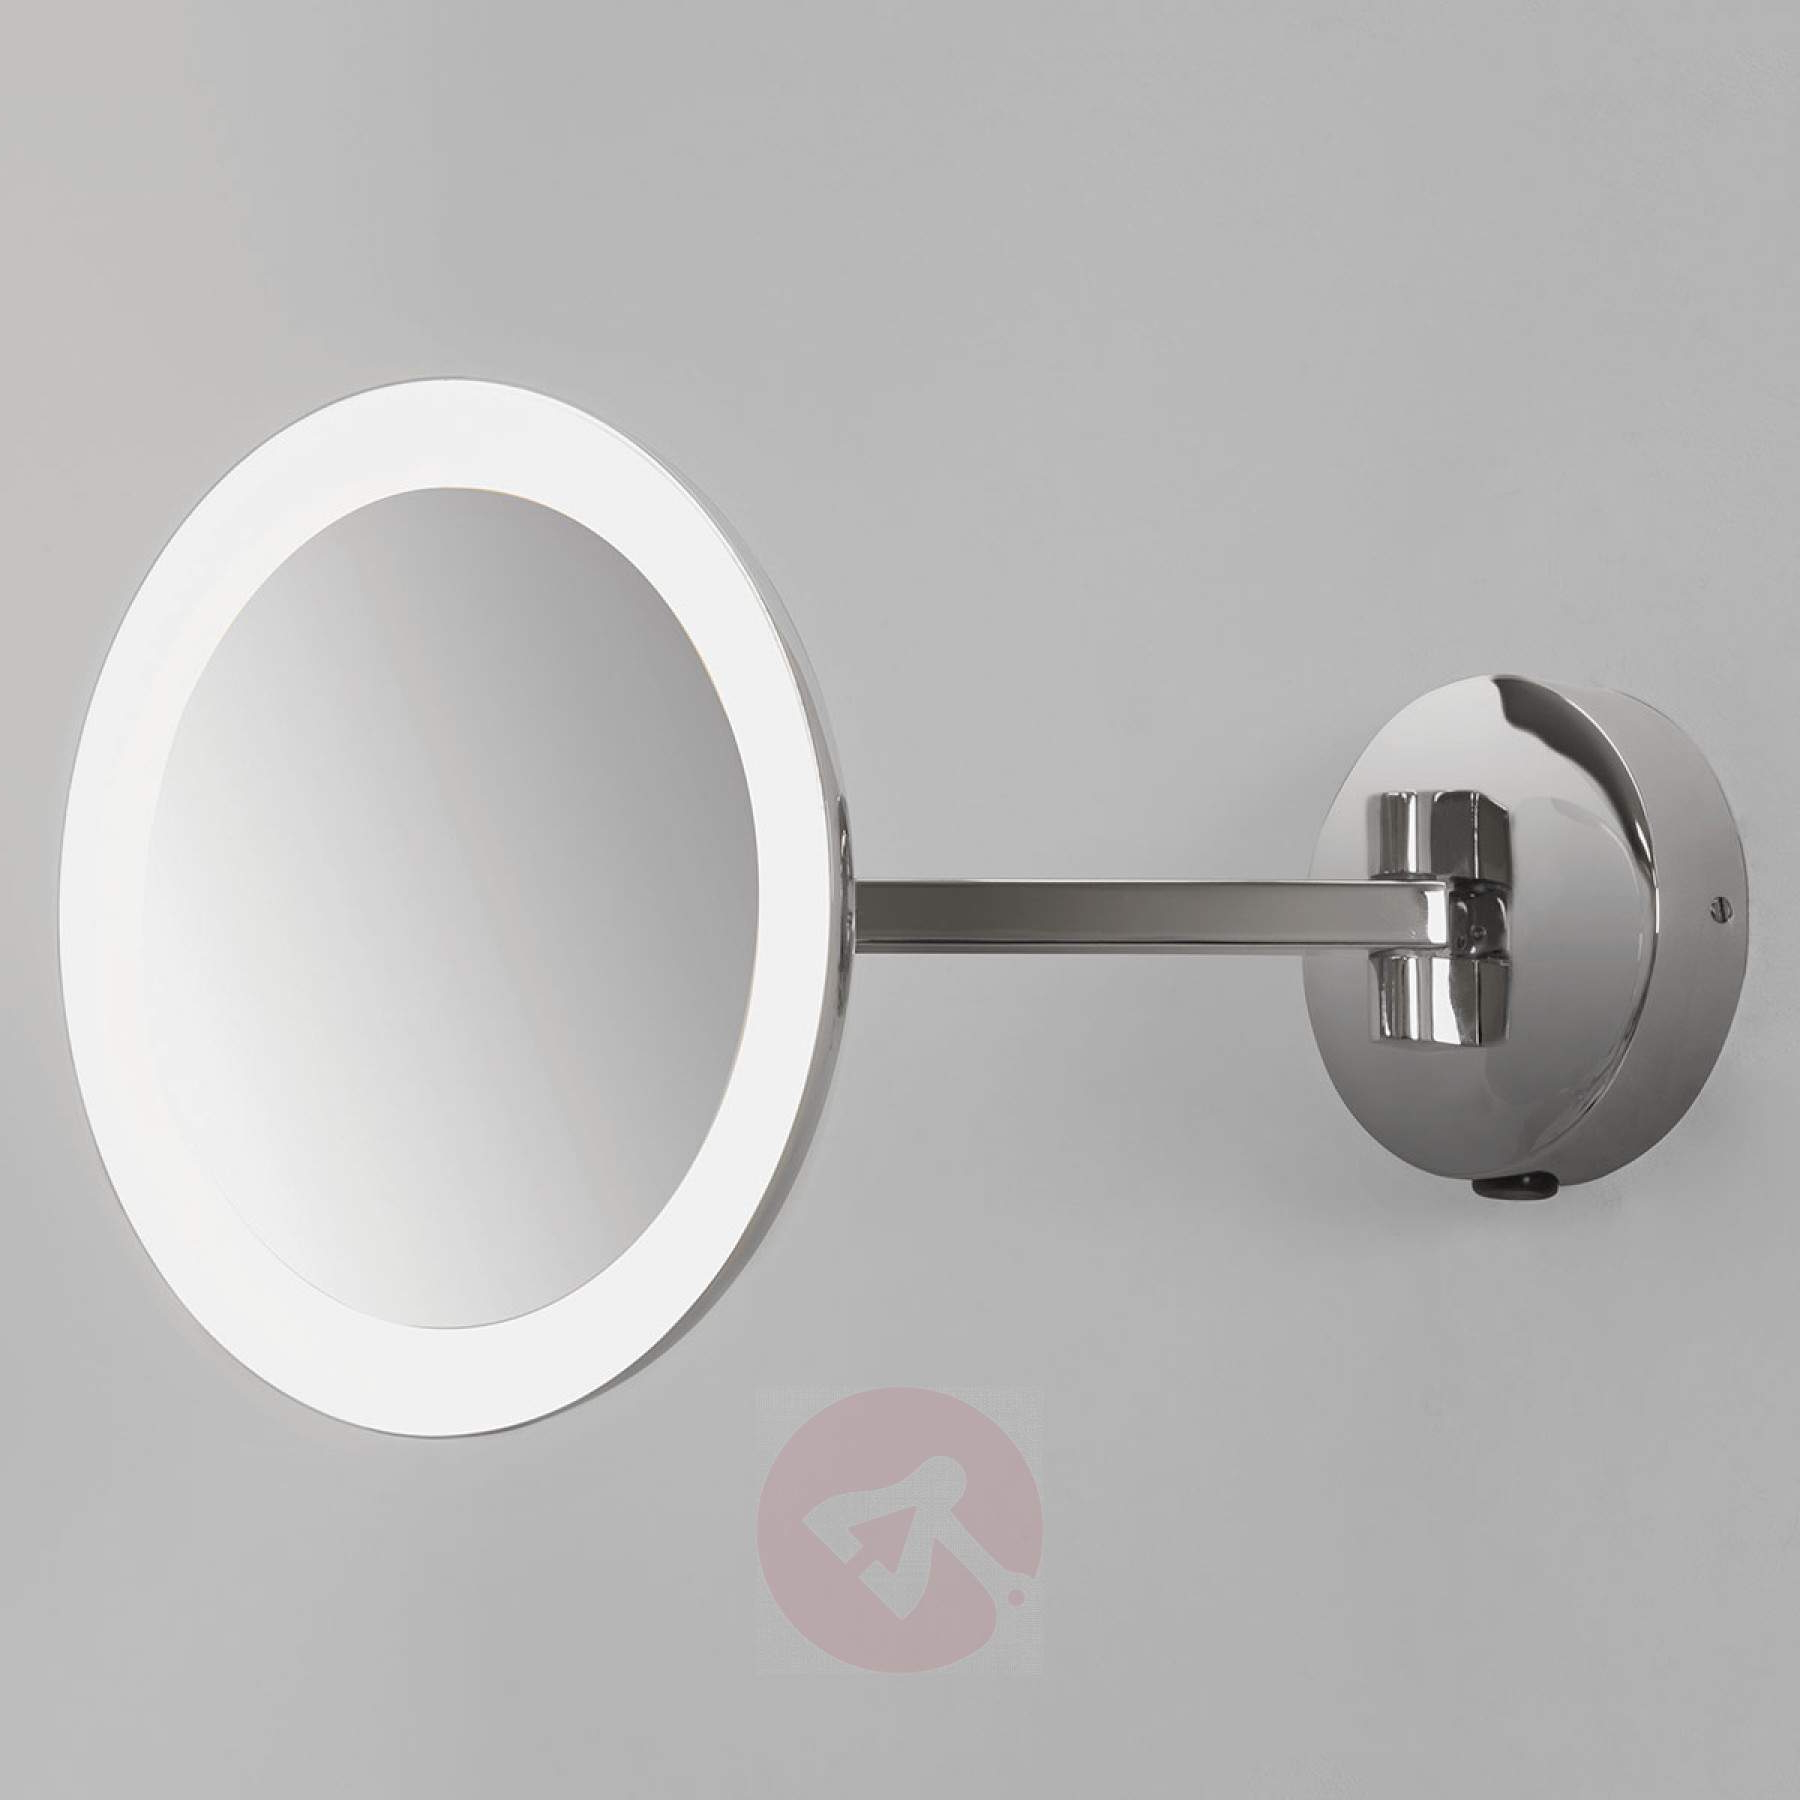 2019 Illuminated Wall Mirrors Regarding Illuminated Wall Mirror Mascali With Led (View 1 of 20)